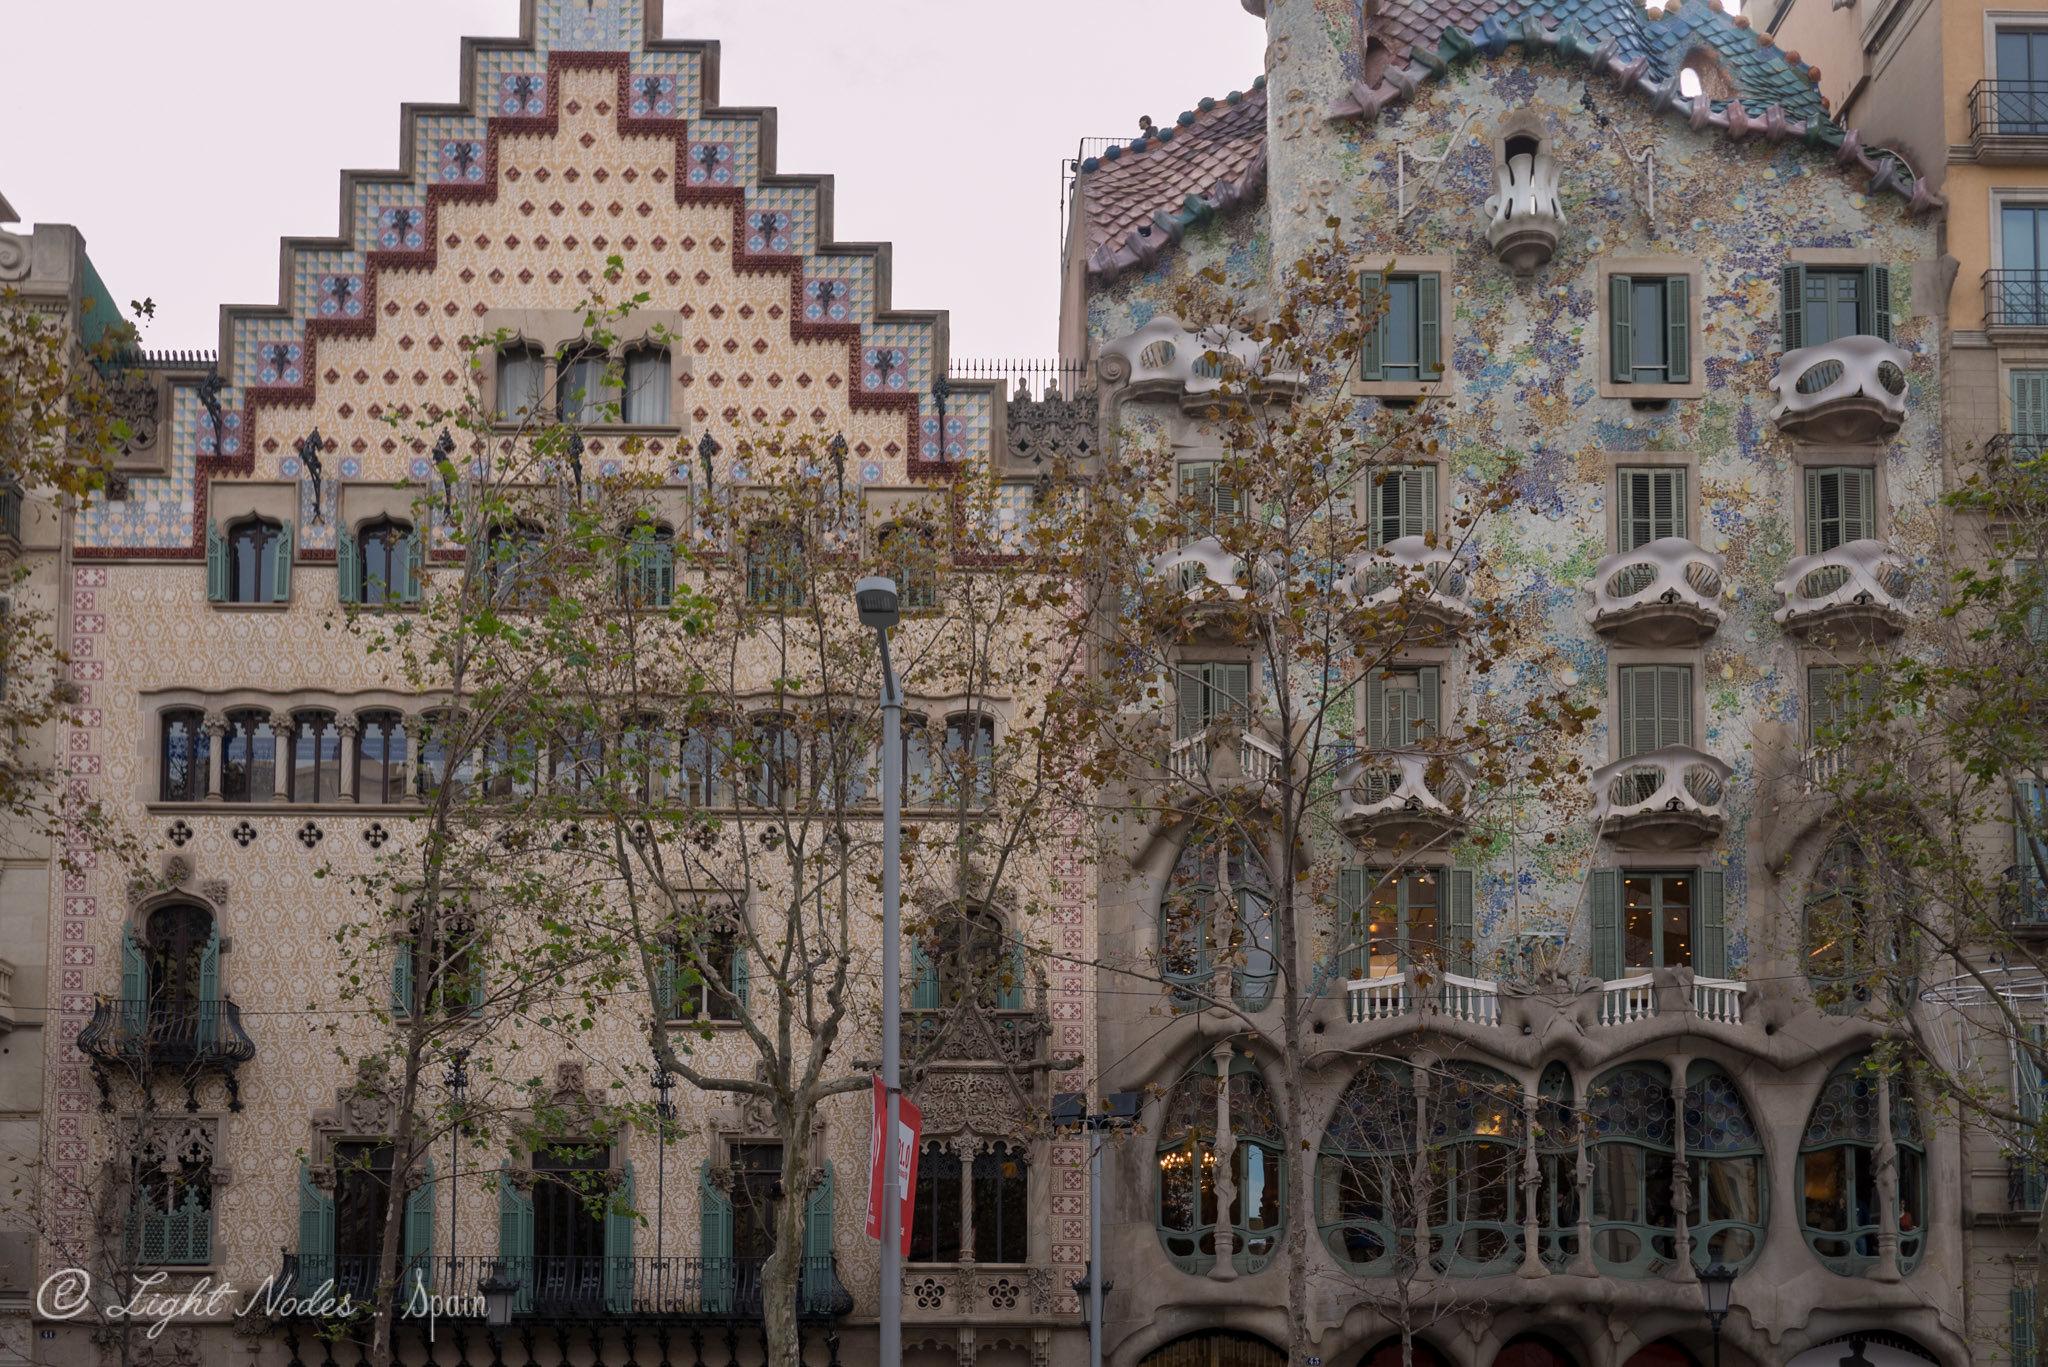 Casa Batlló (Antoni Gaudi's masterpiece) Barcelona, Spain with DMC GX7